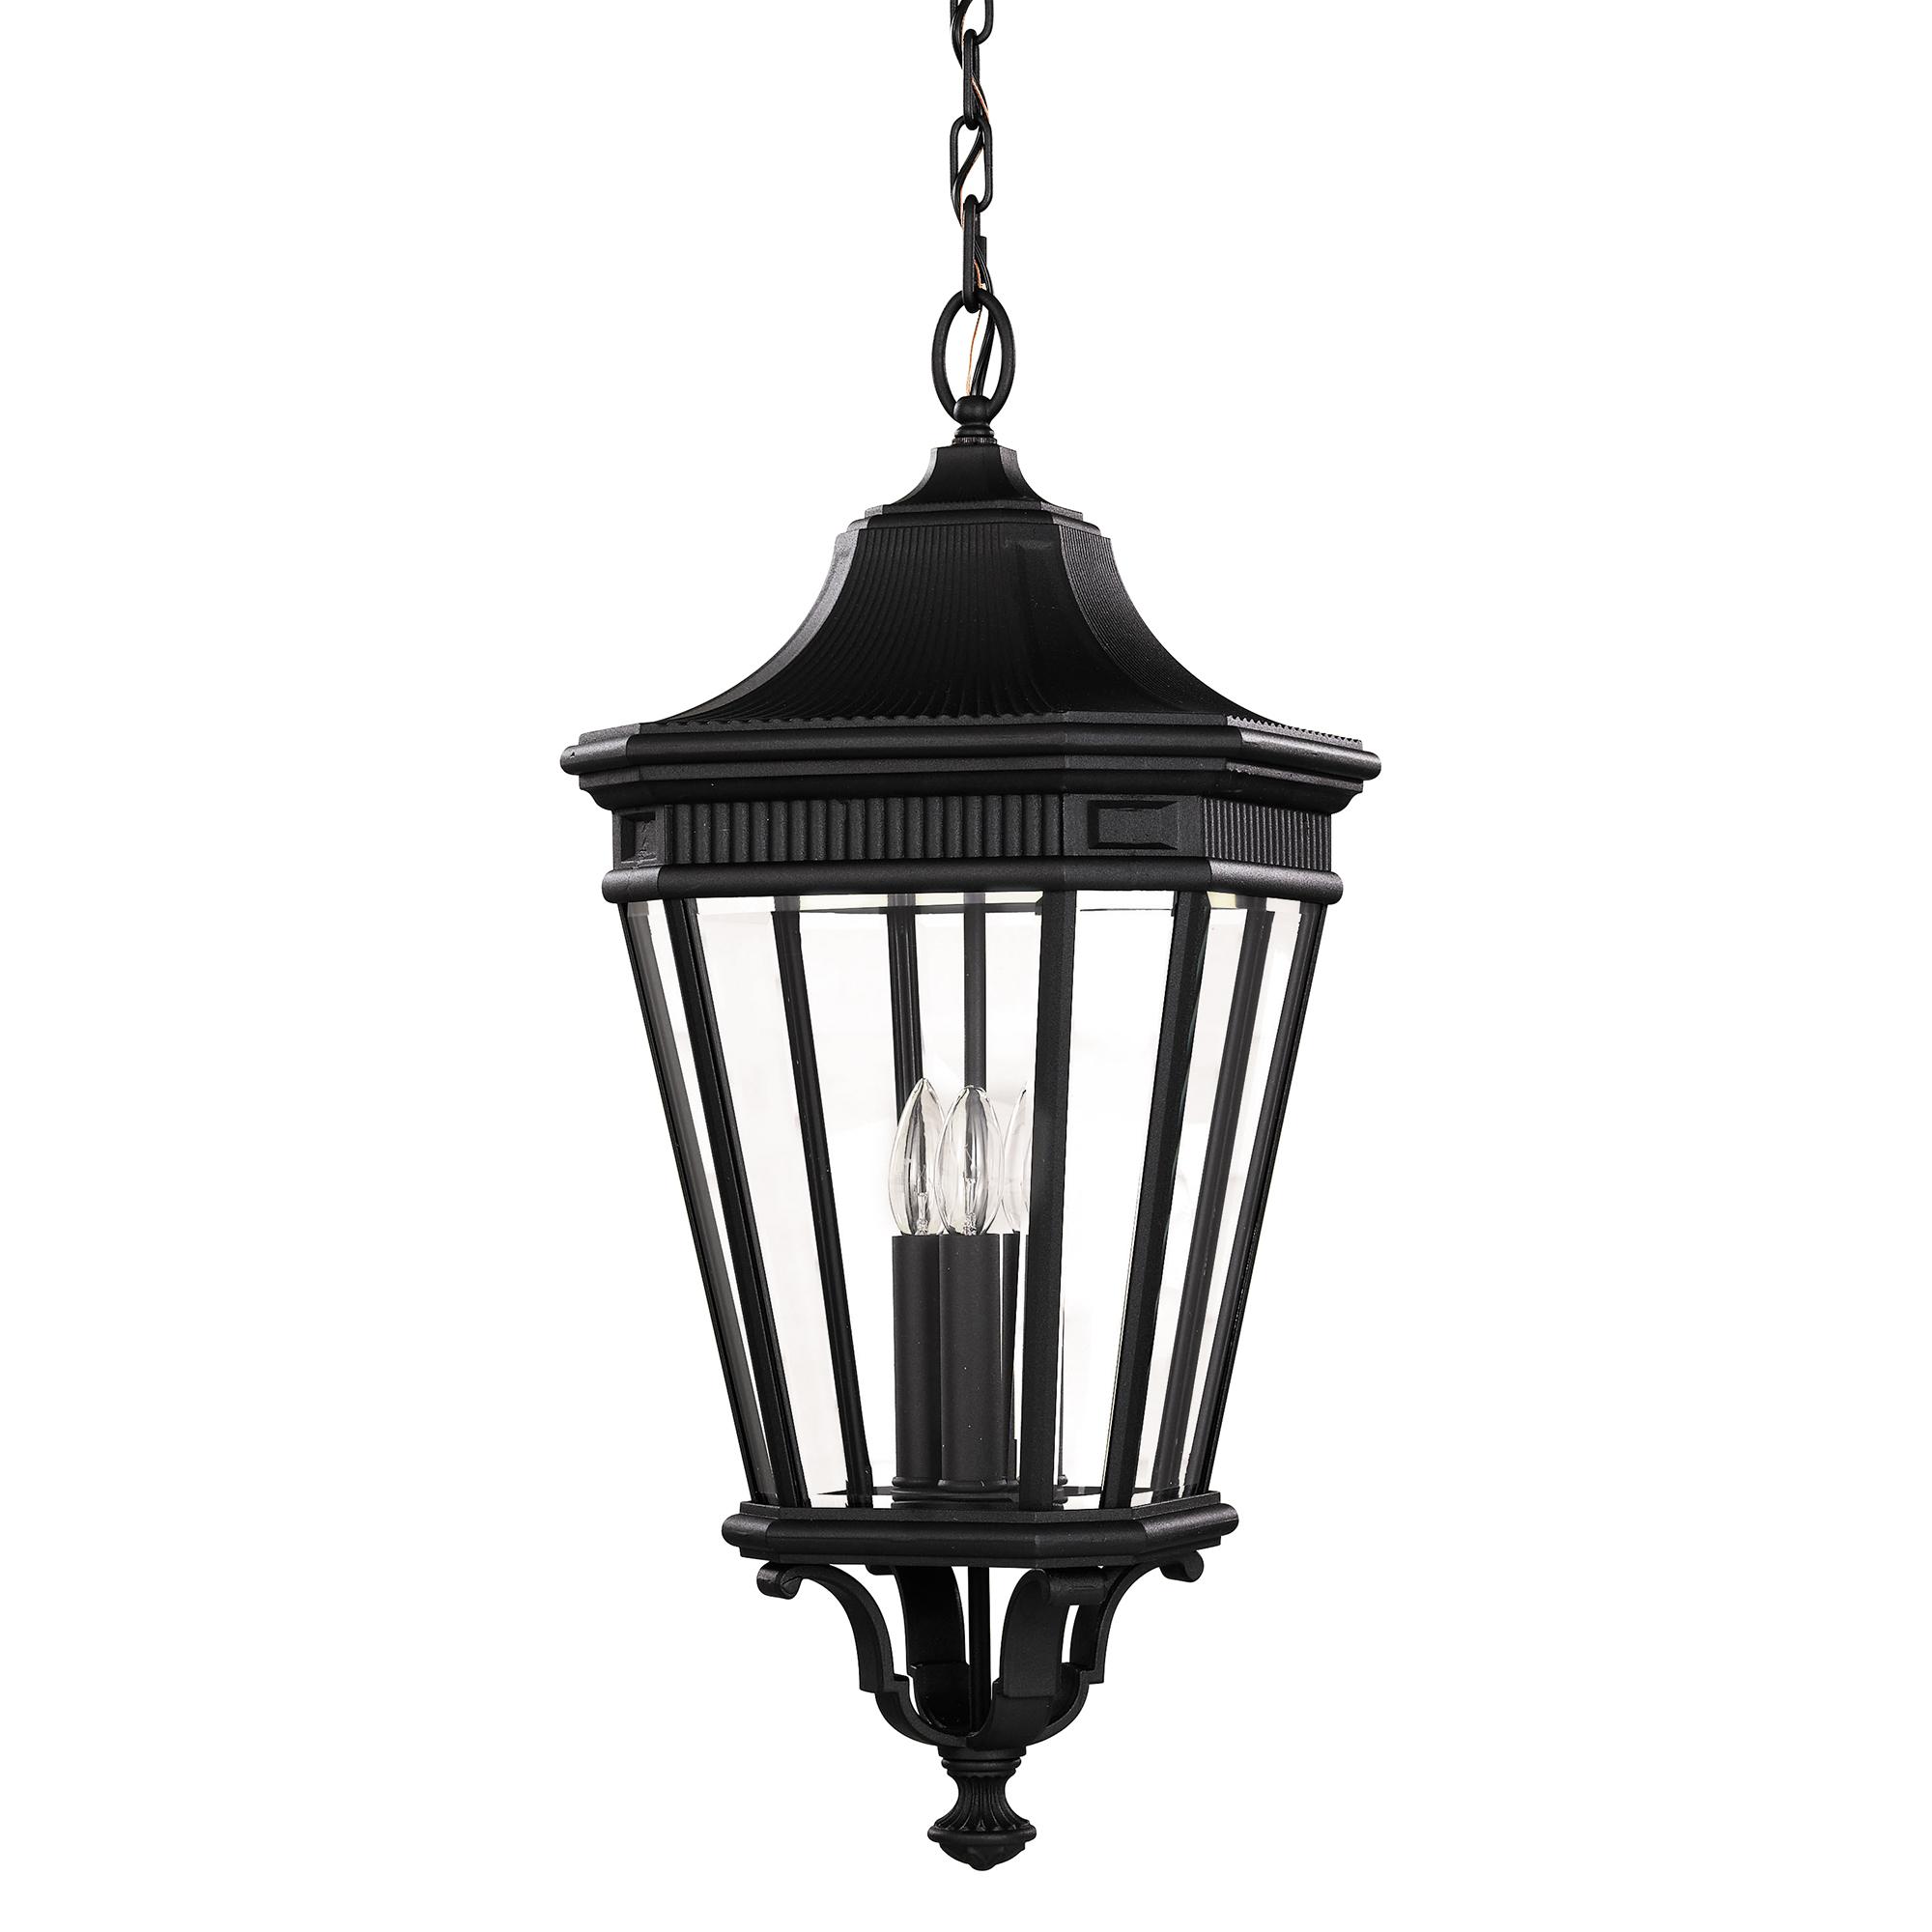 Feiss Cotswold Lane Large Chain Lantern 3 X 60w E14 220 240v 50hz Ip23 Cl